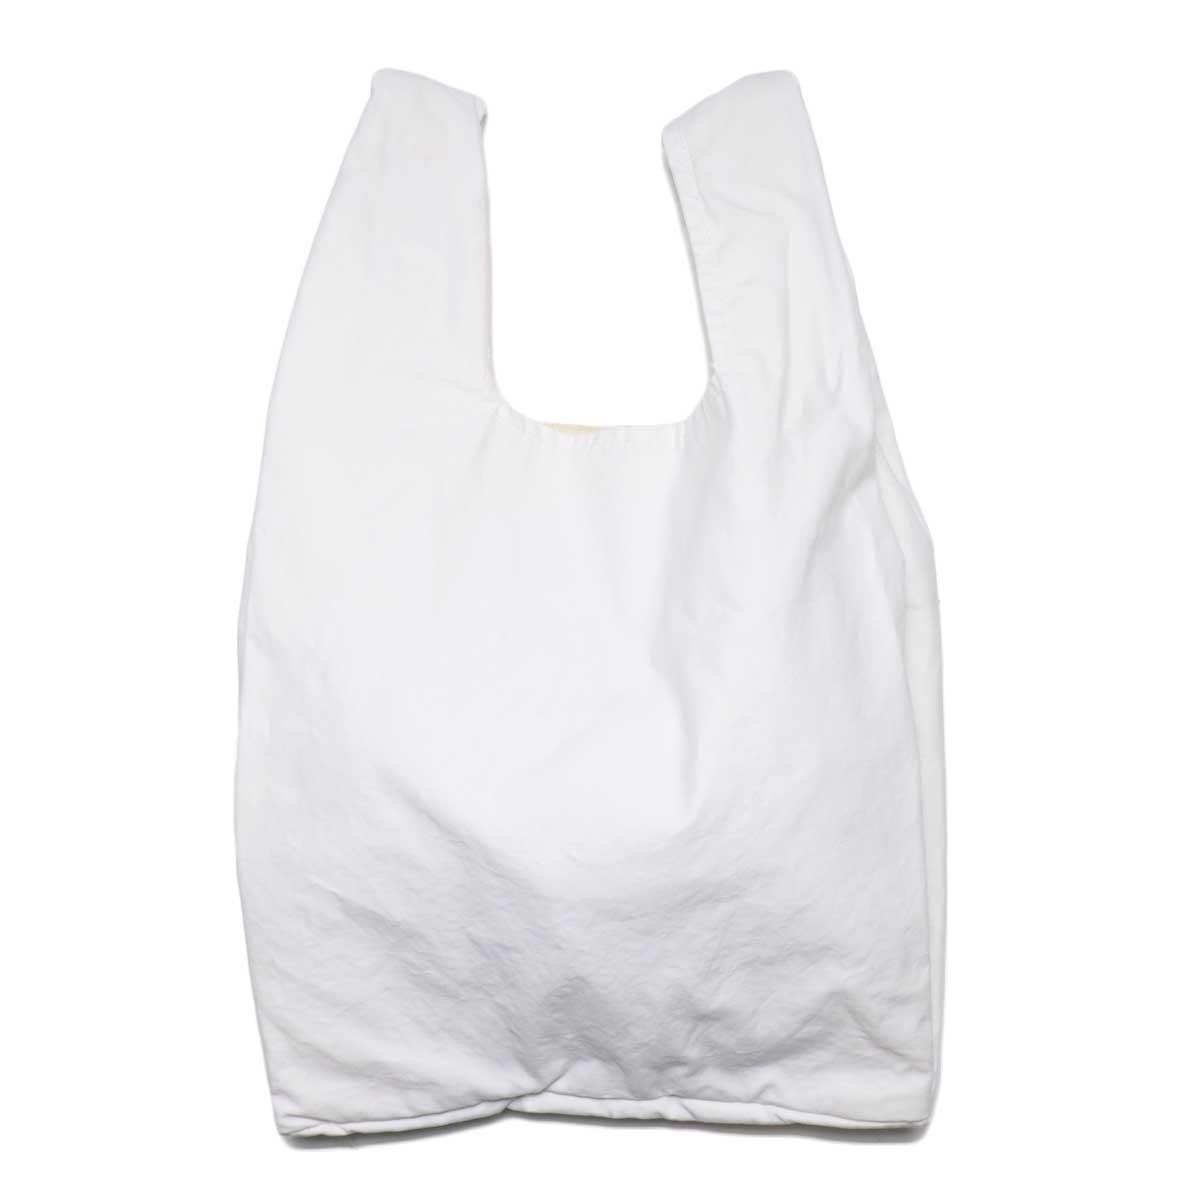 MASTER & Co. / ECO BAG SMALL (White)